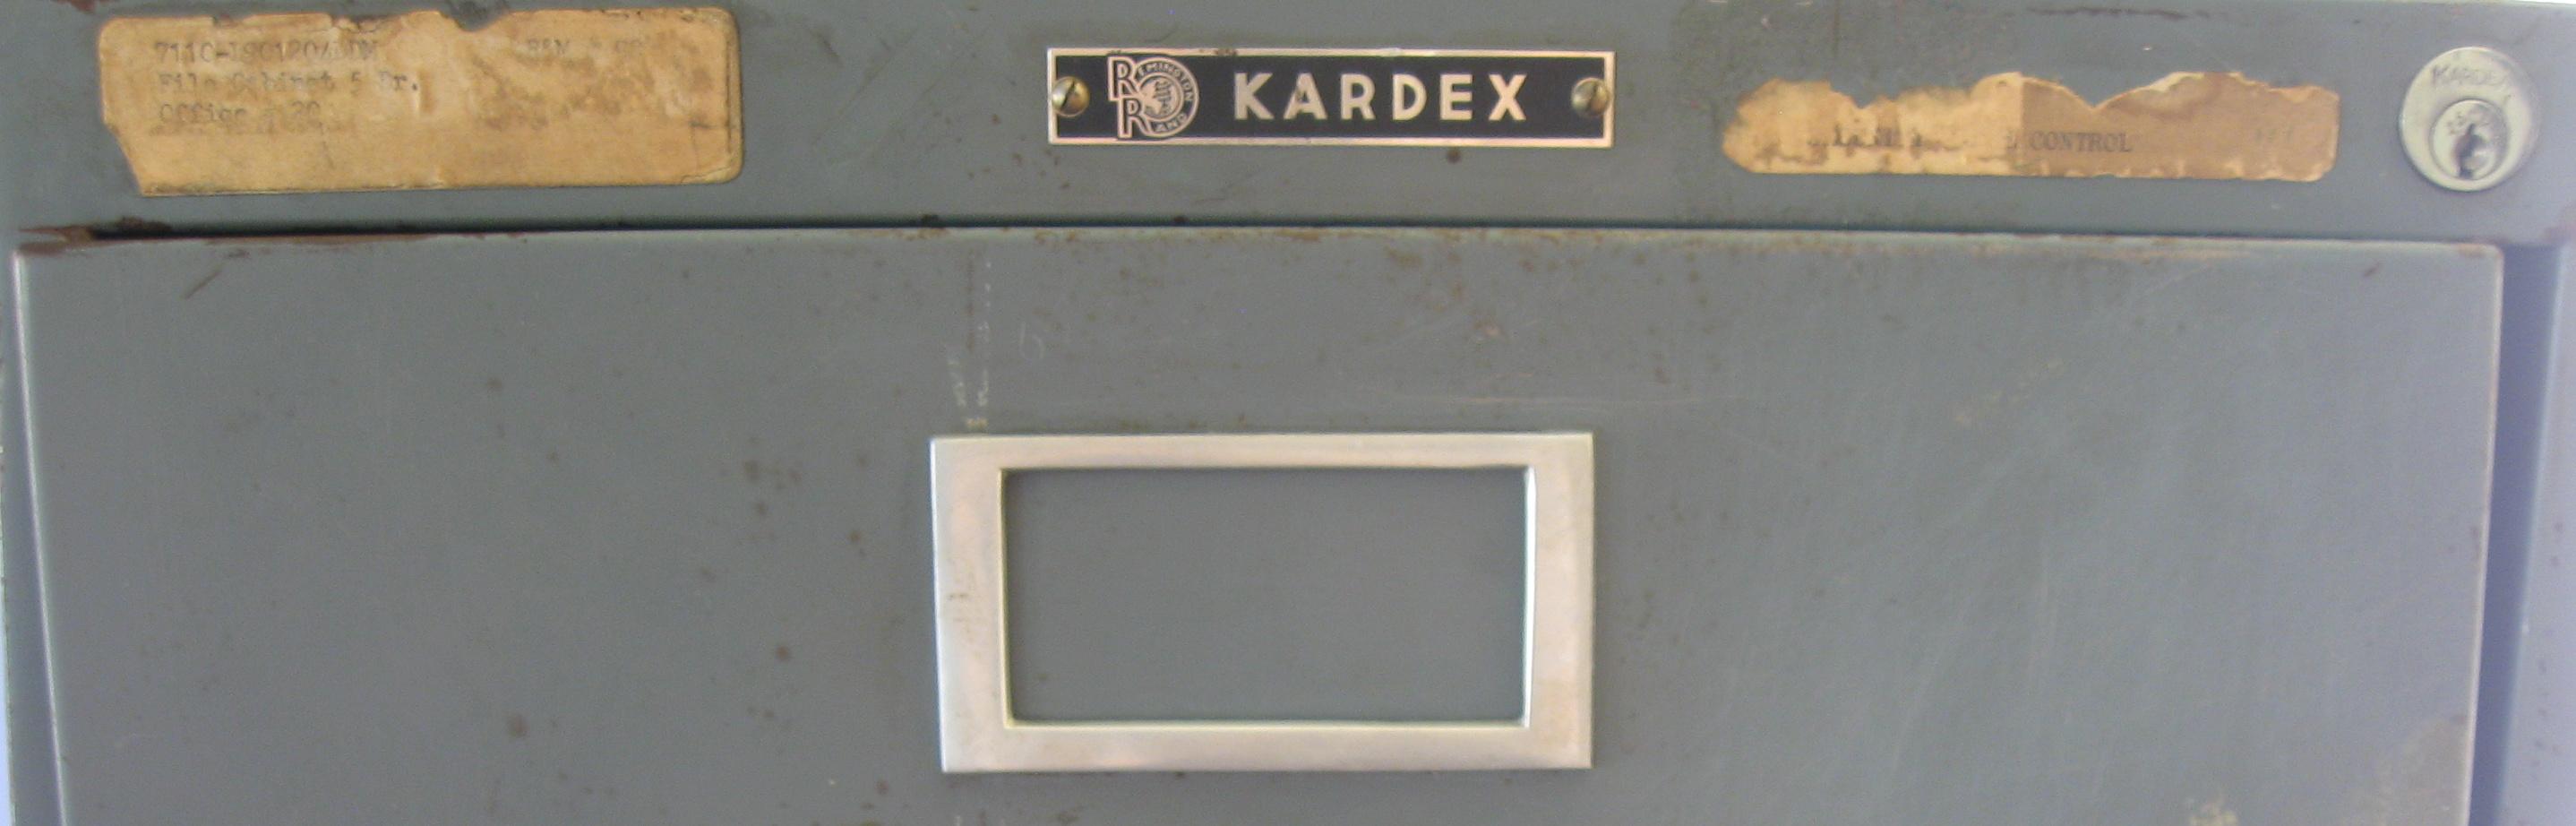 Mein Remington Rand Kardex